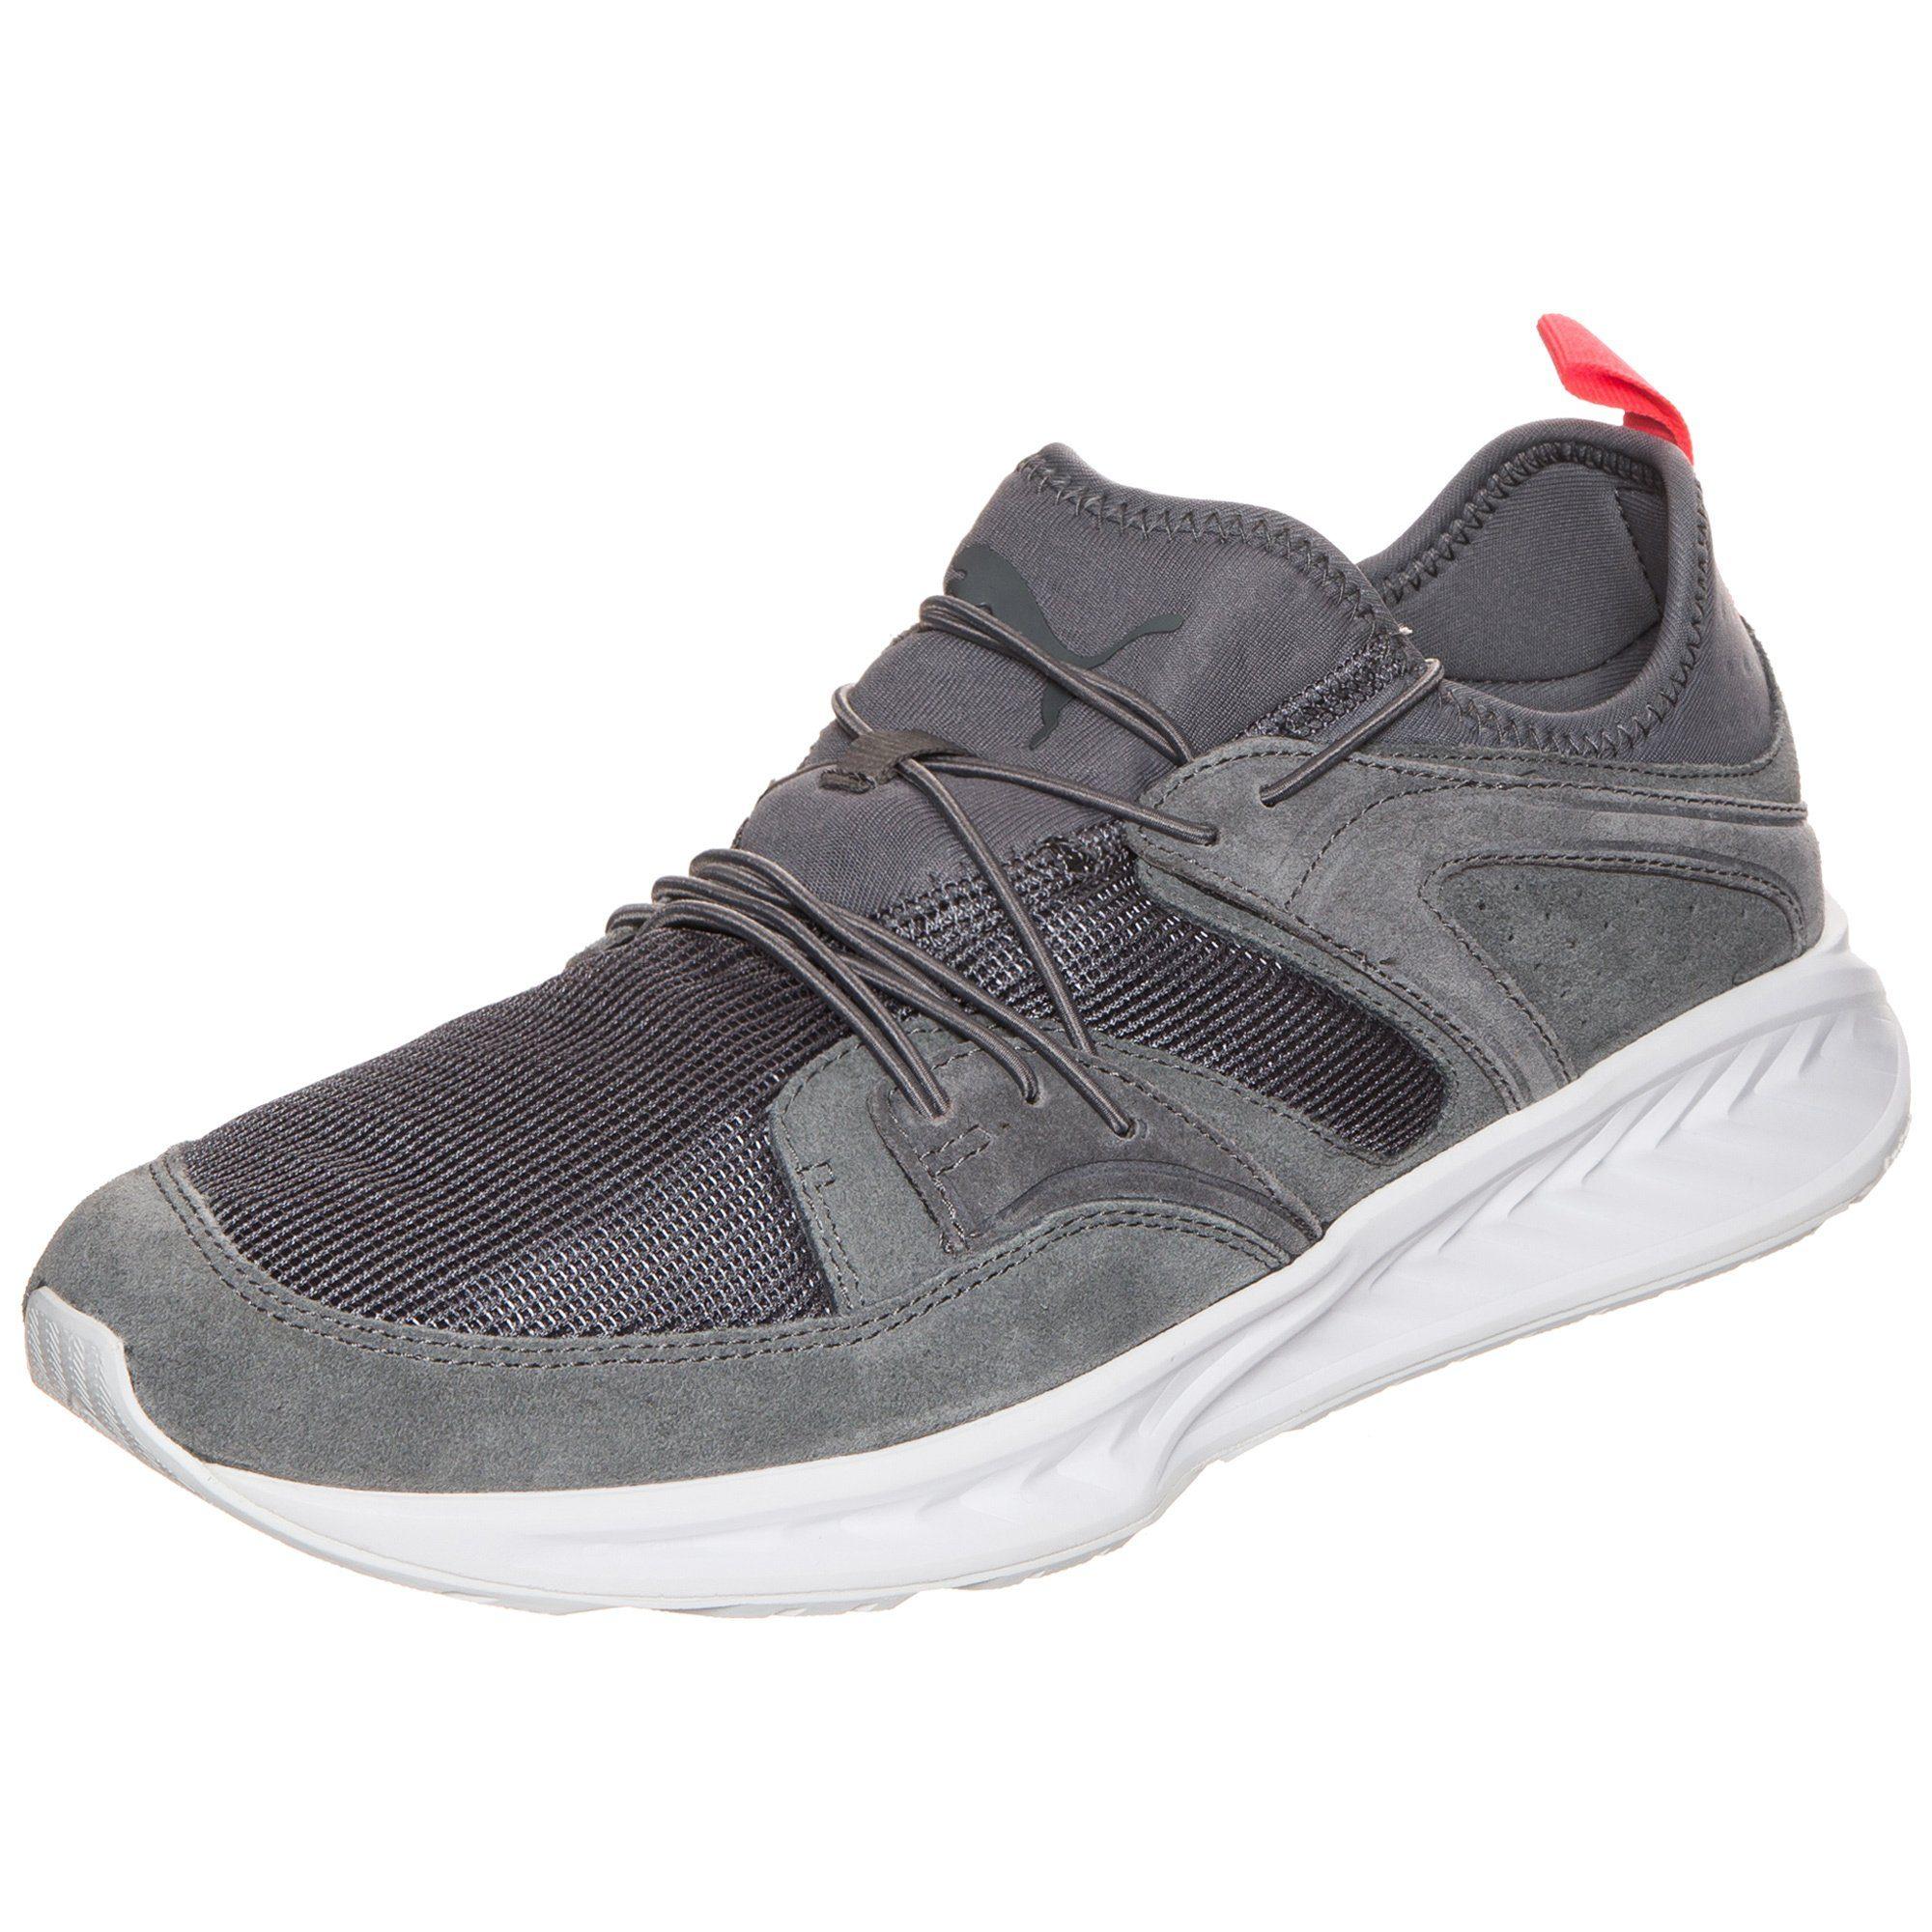 PUMA Blaze Ignite Plus Sneaker online kaufen  grau #ft5_slash# korall